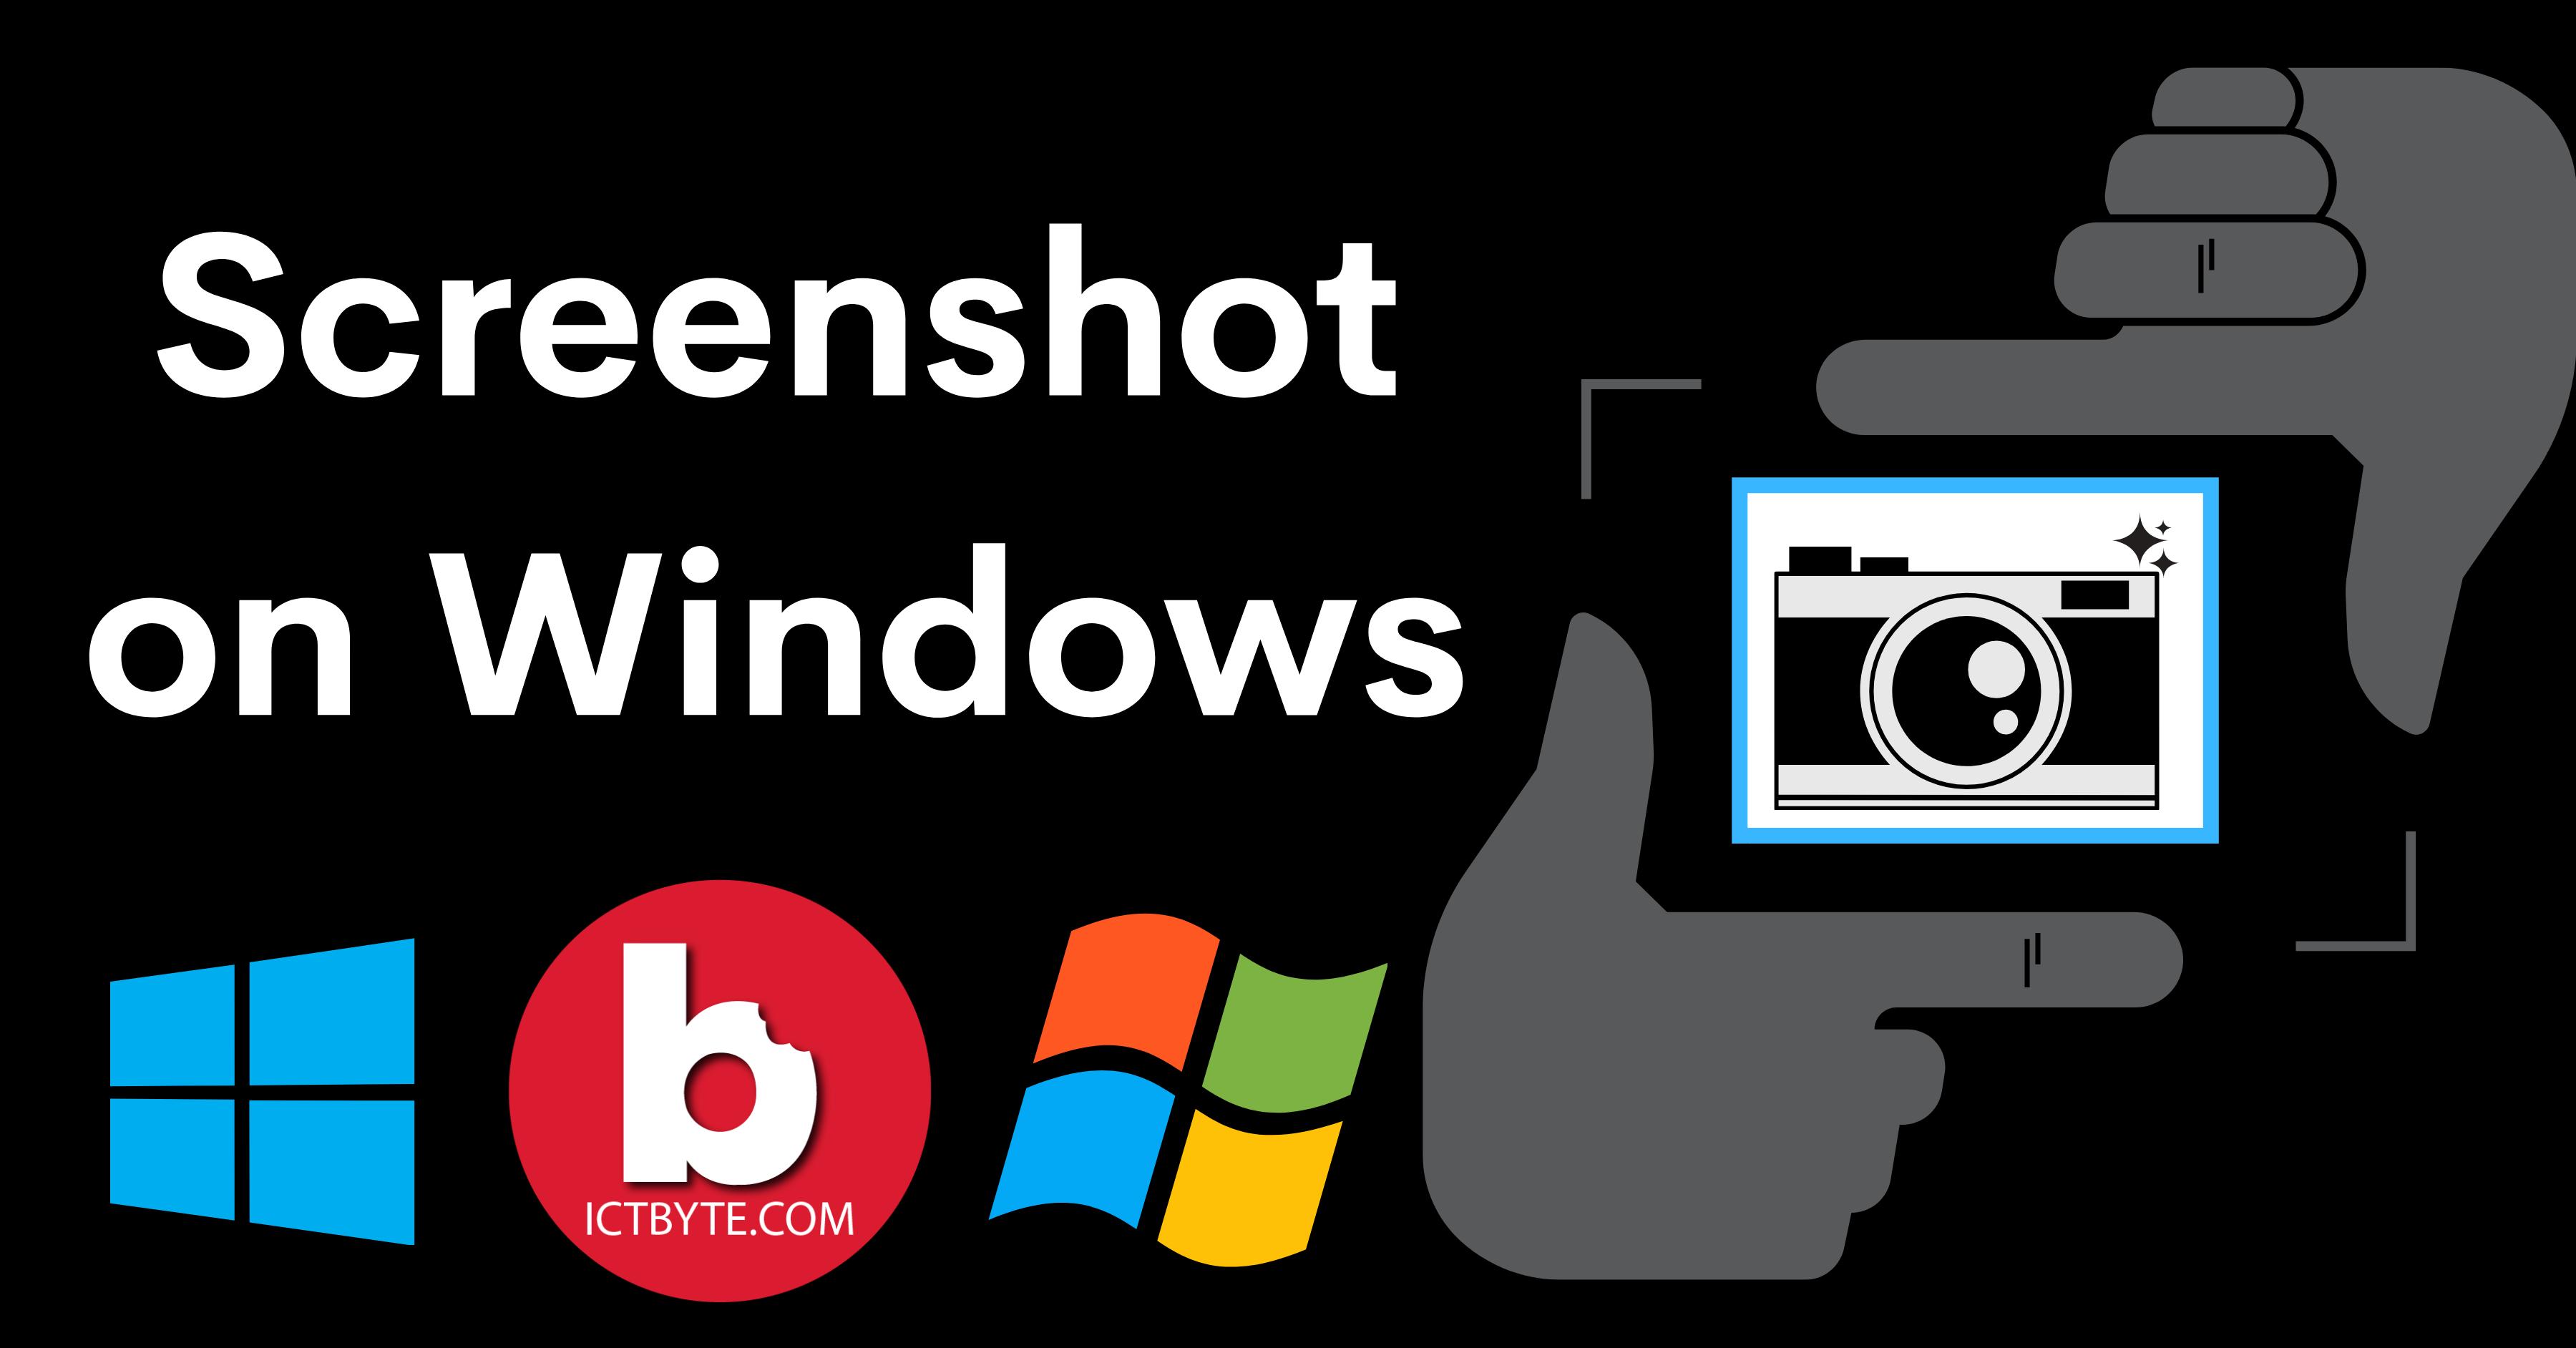 How to take screenshot on Windows ?